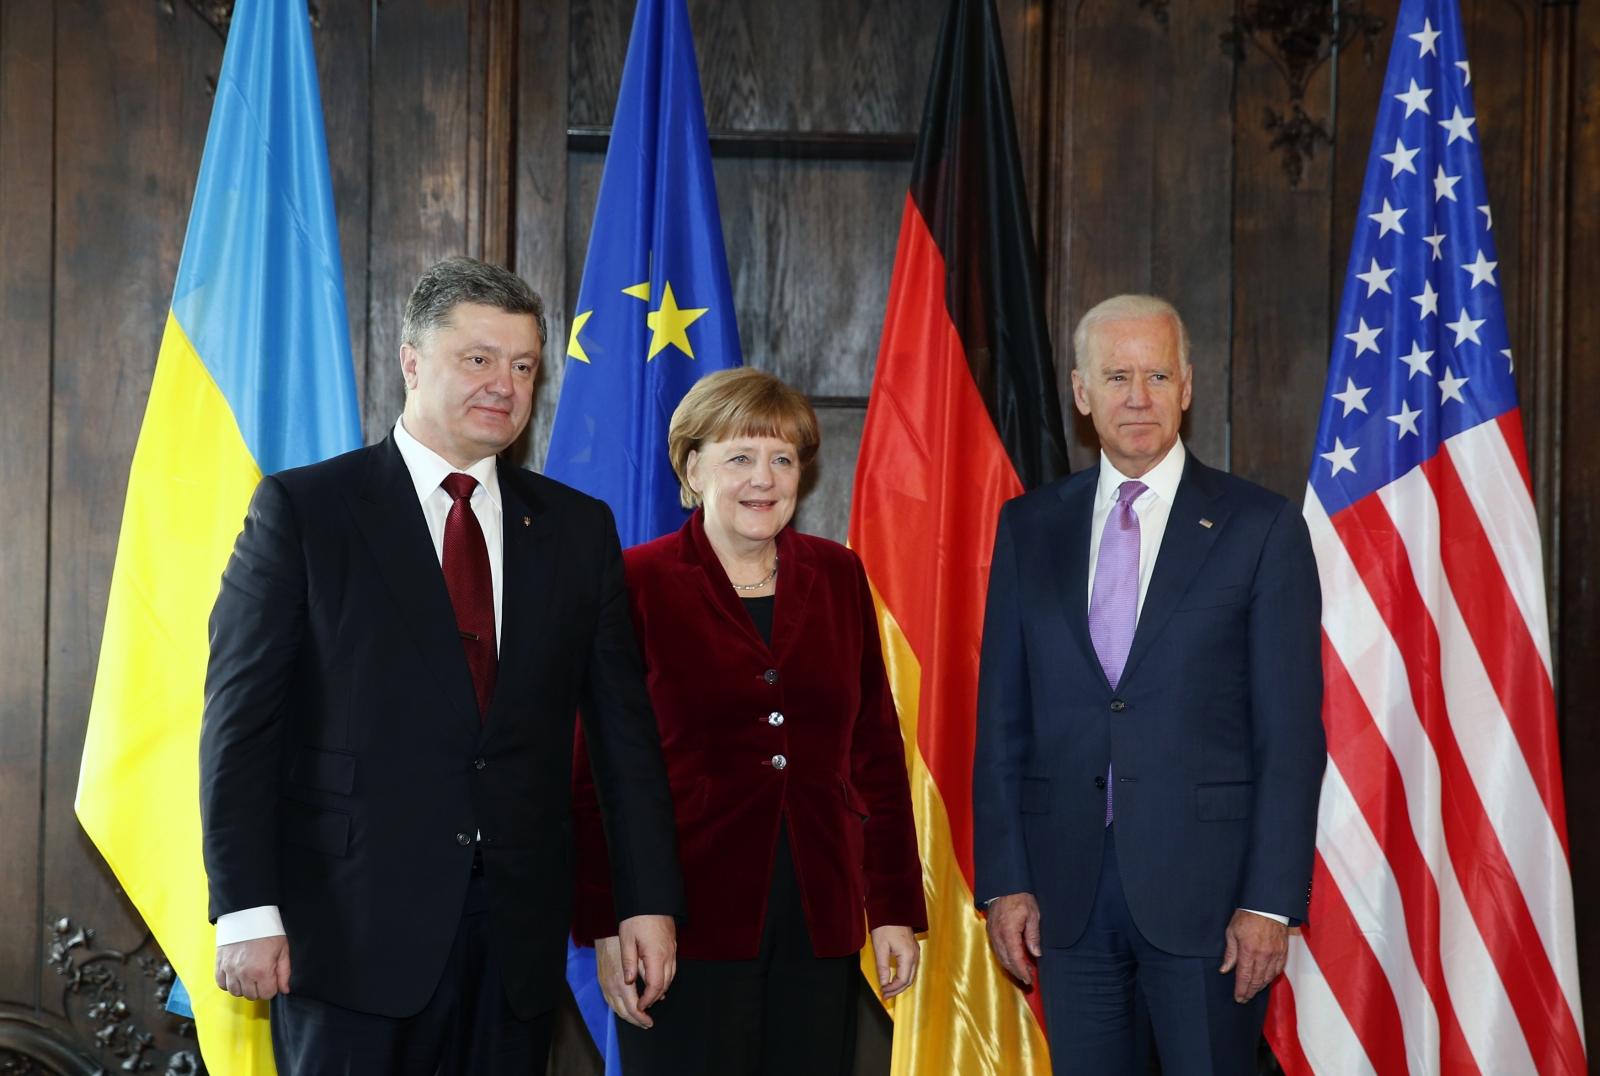 Ukraine's President Petro Poroshenko, German Chancellor Angela Merkel and U.S. Vice President Joe Biden (L-R) pose during the 51st Munich Security Conference